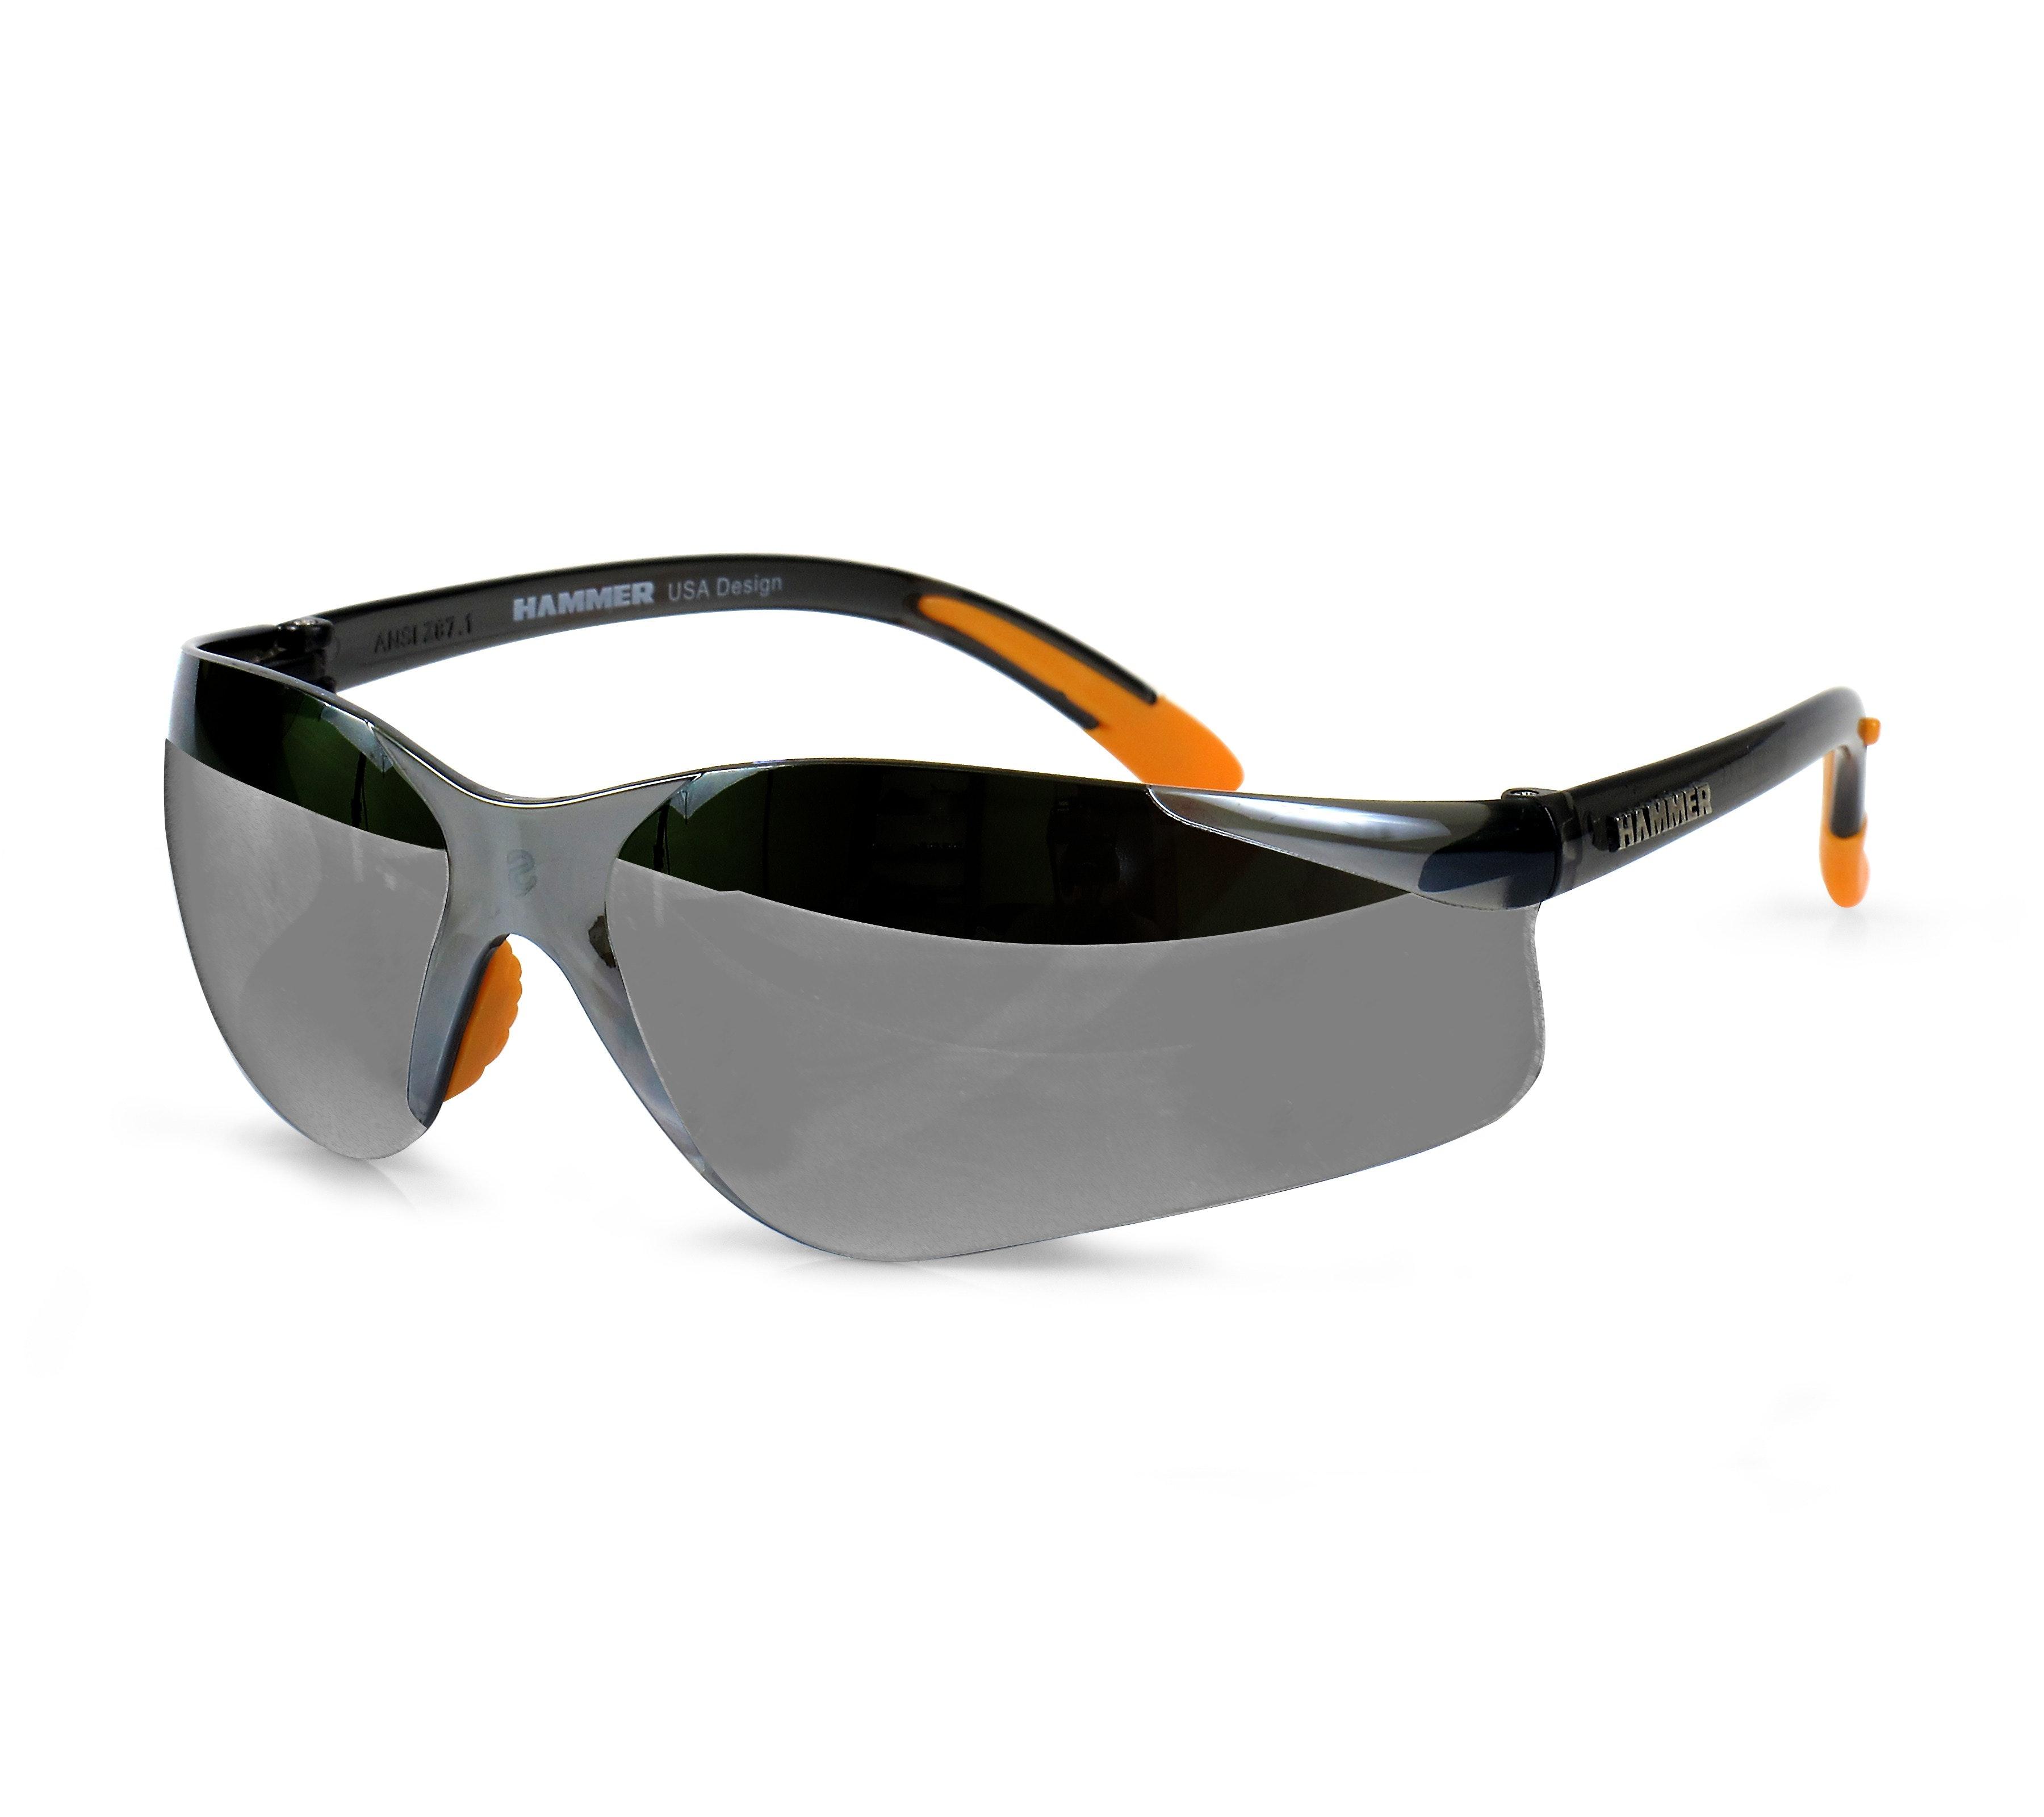 91f0e24fff93 Black Lens Sports Sunglasses · Free Stock Photo